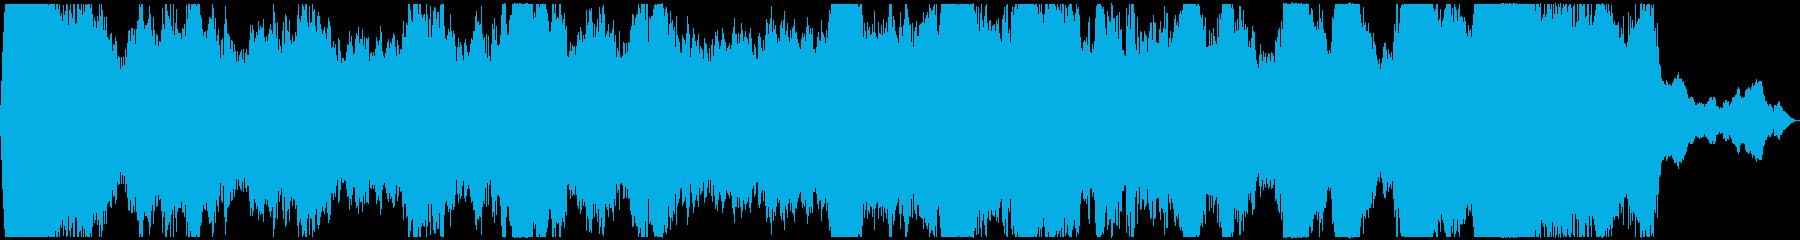 PADS 低音01の再生済みの波形